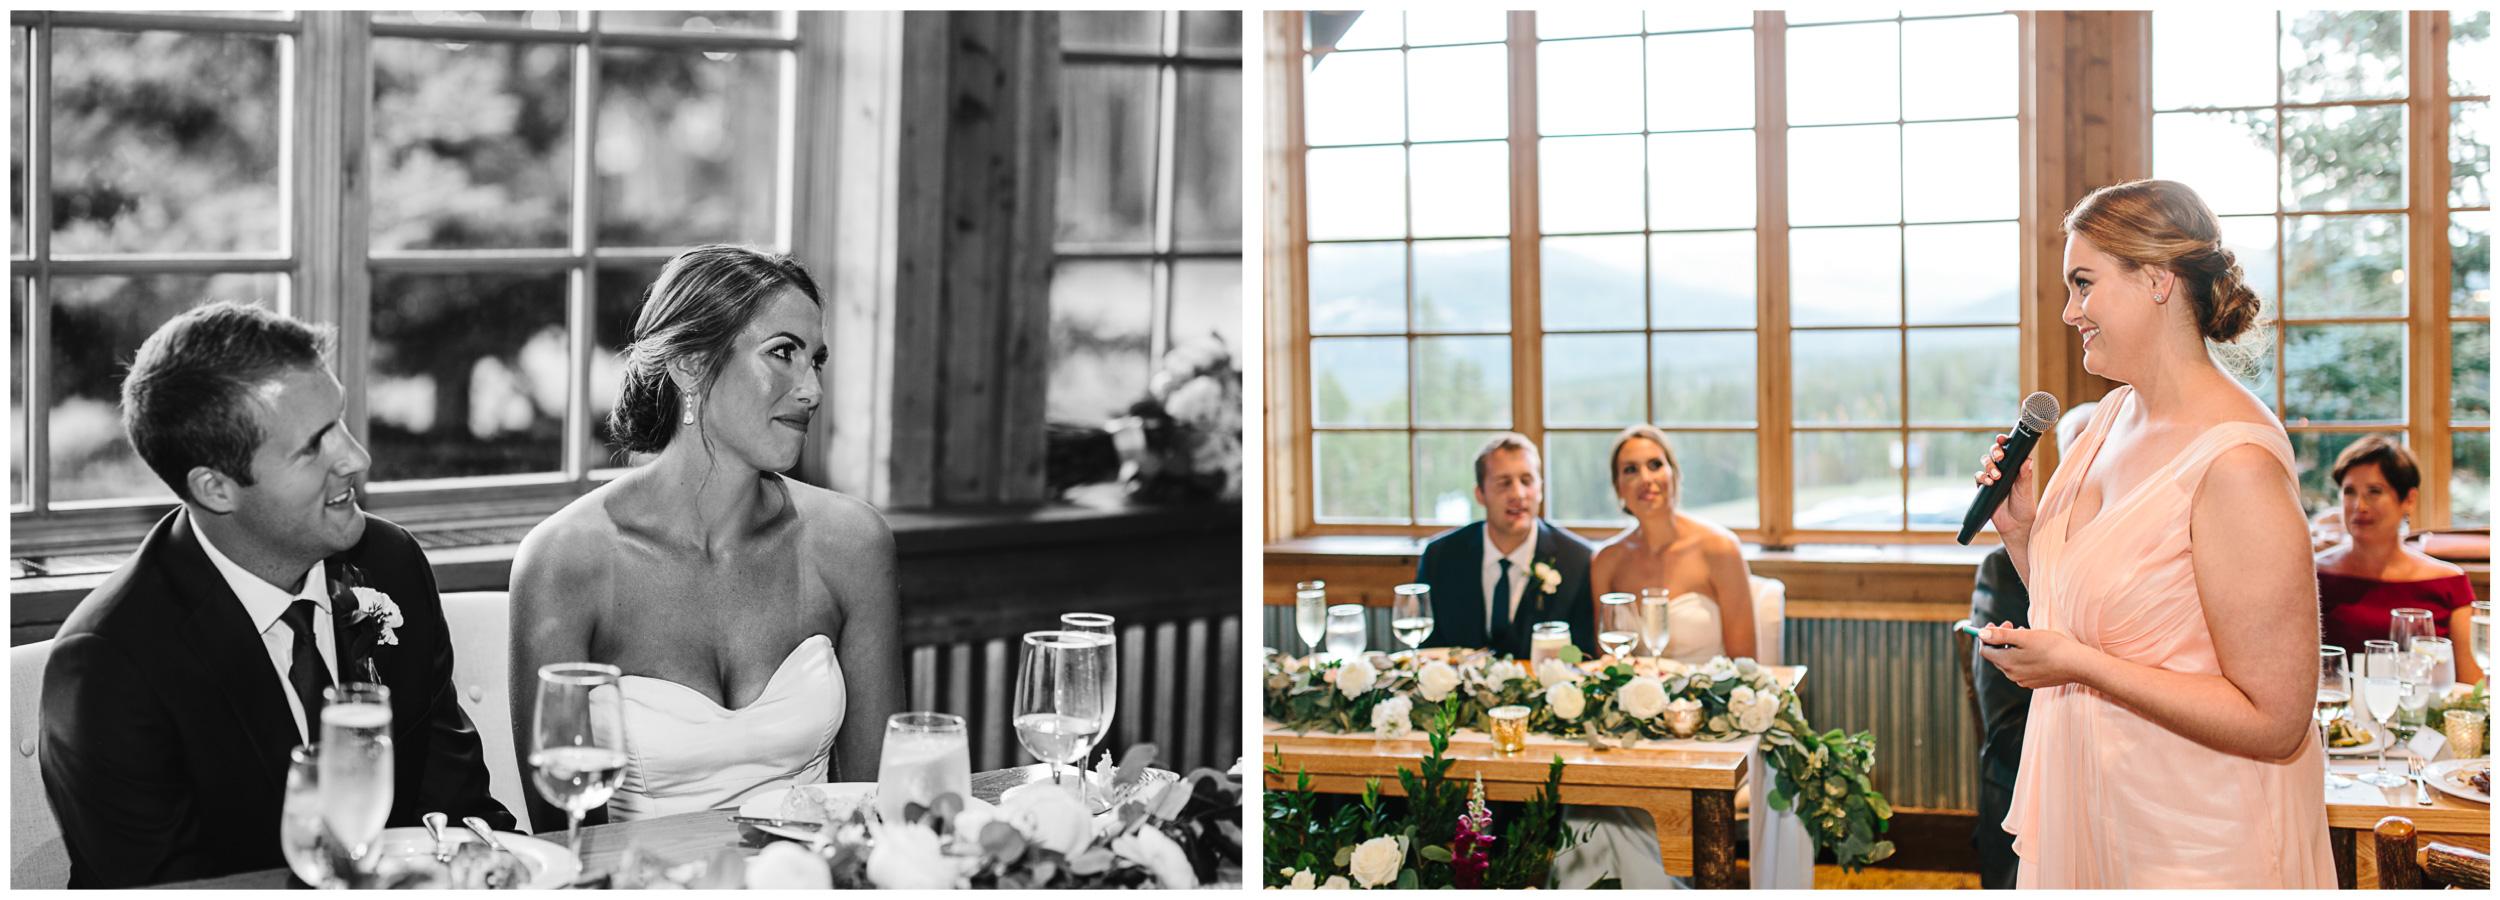 breckenridge_wedding_74.jpg